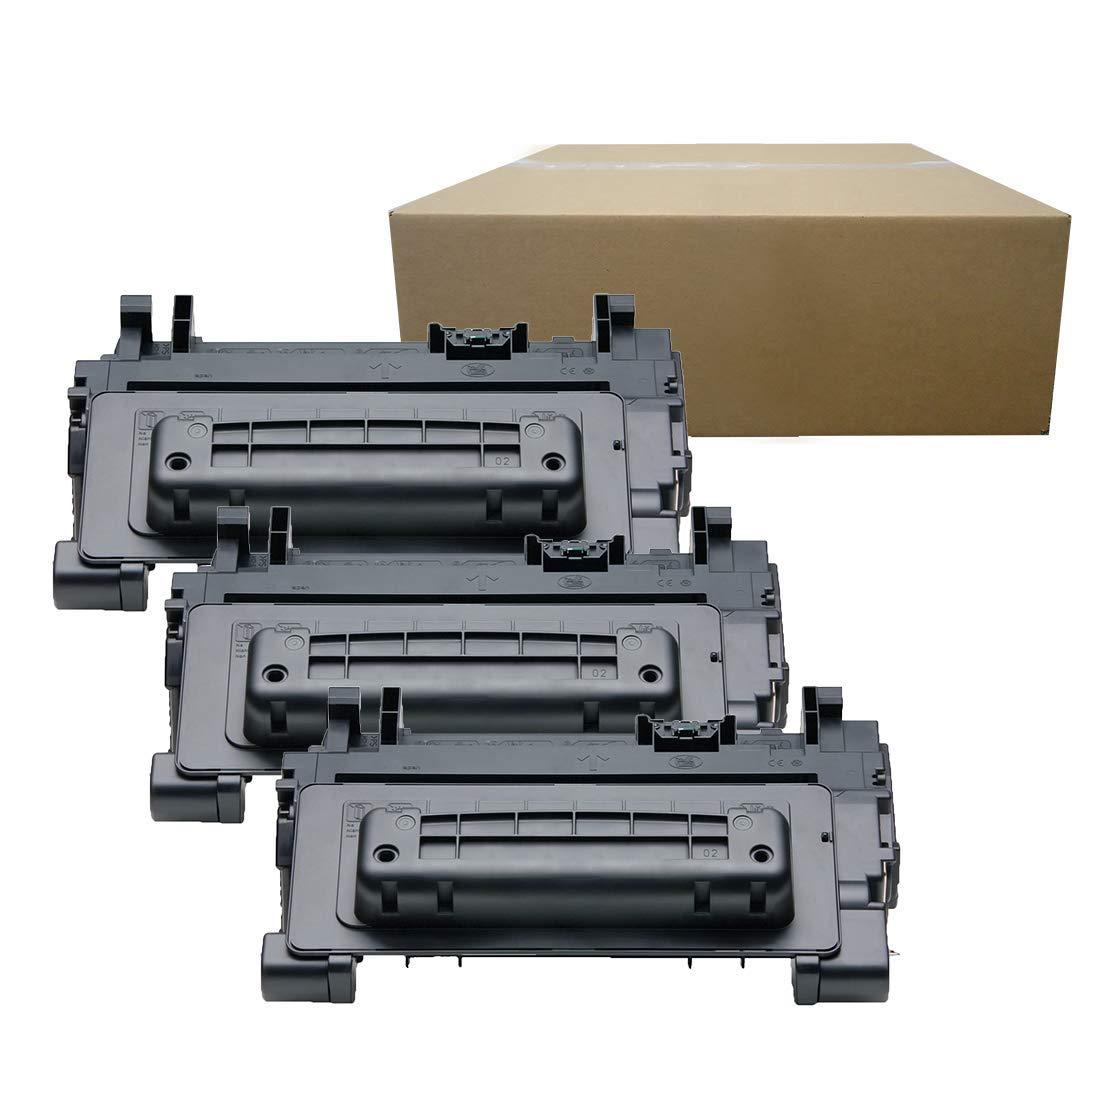 3 PK CC364X 64X High Yield Toner Cartridge For HP LaserJet P4015n P4515n P4515x